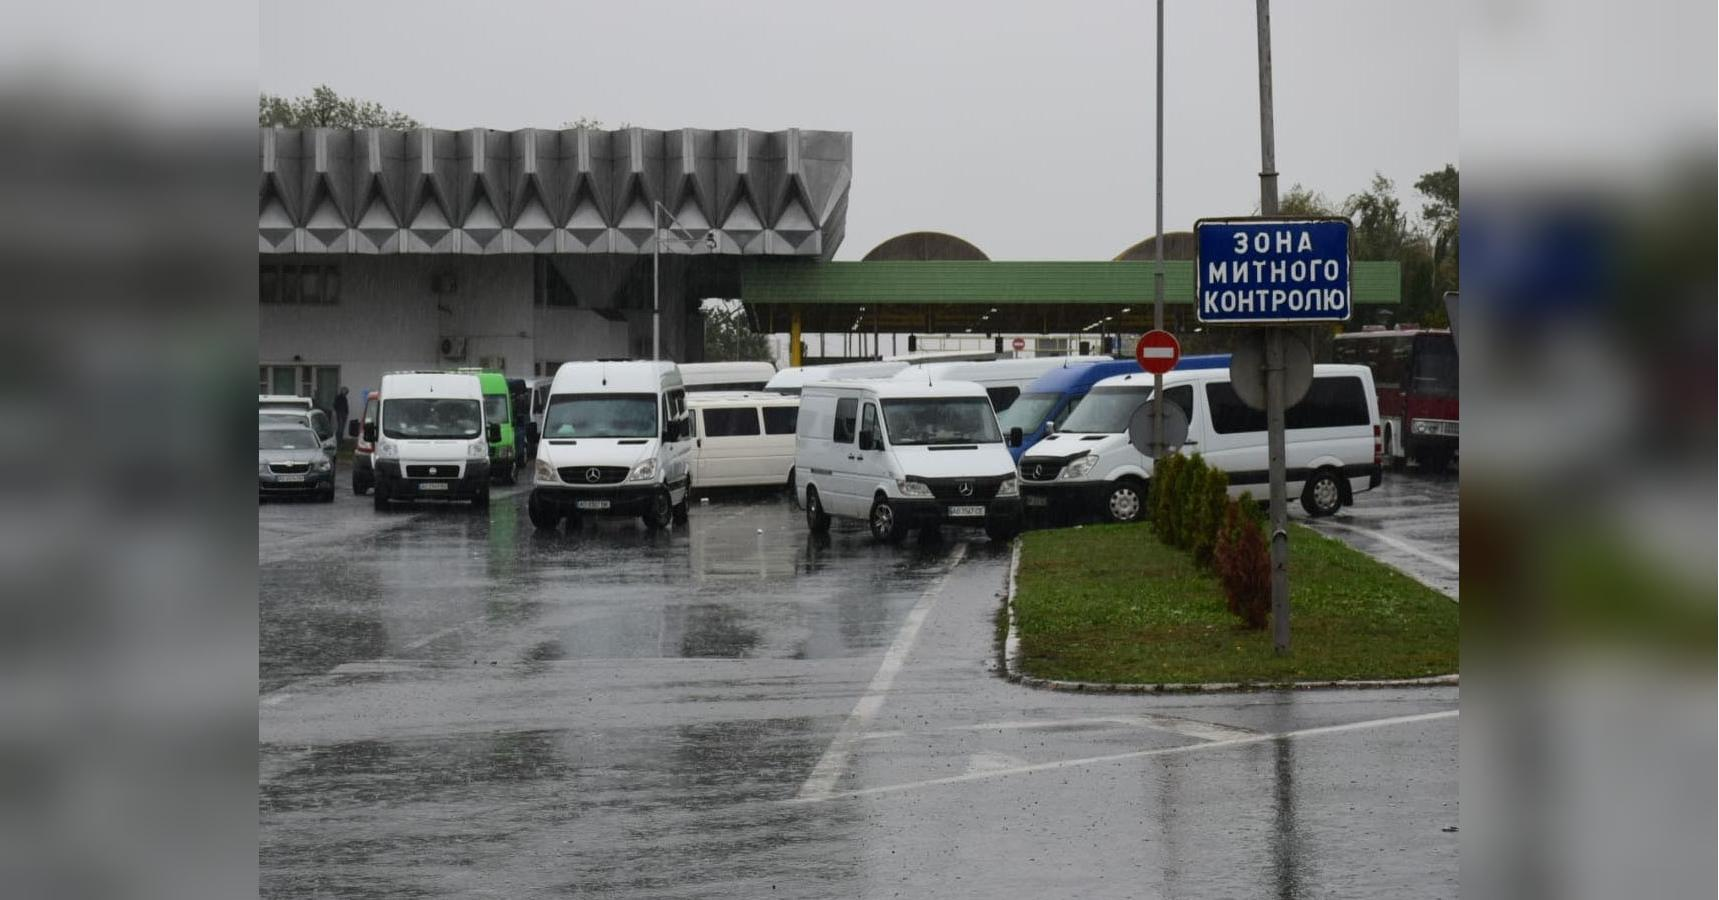 Бусы перекрыли границу